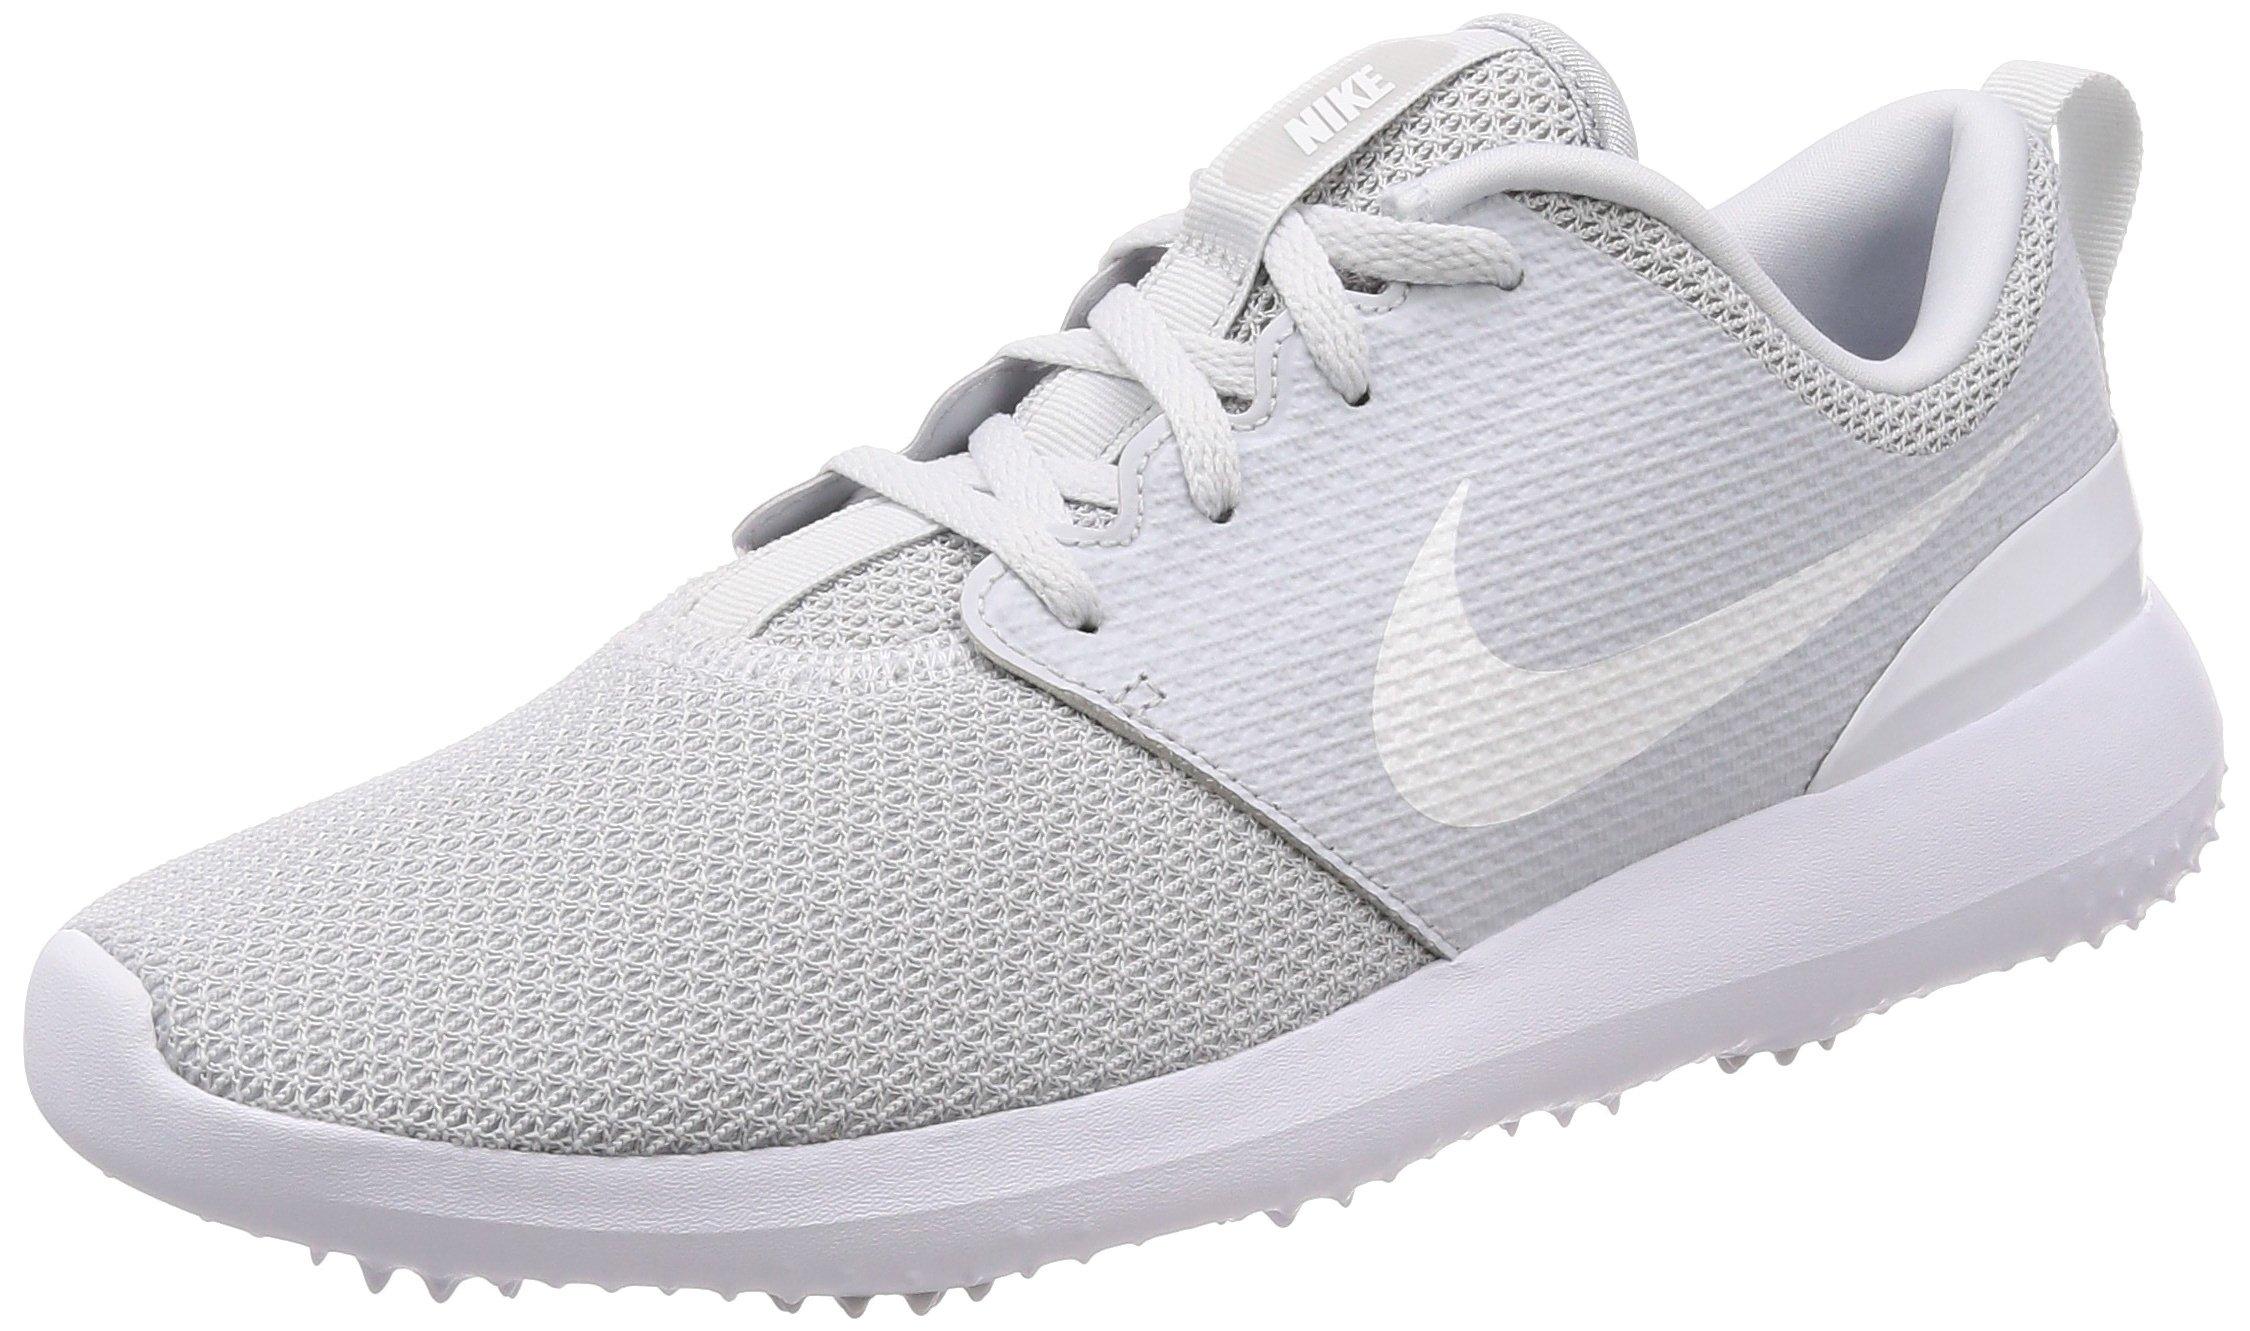 cheap for discount 85caa fdd99 Nike Men s Roshe G Golf Shoe Pure Platinum White Size 8.5 M US